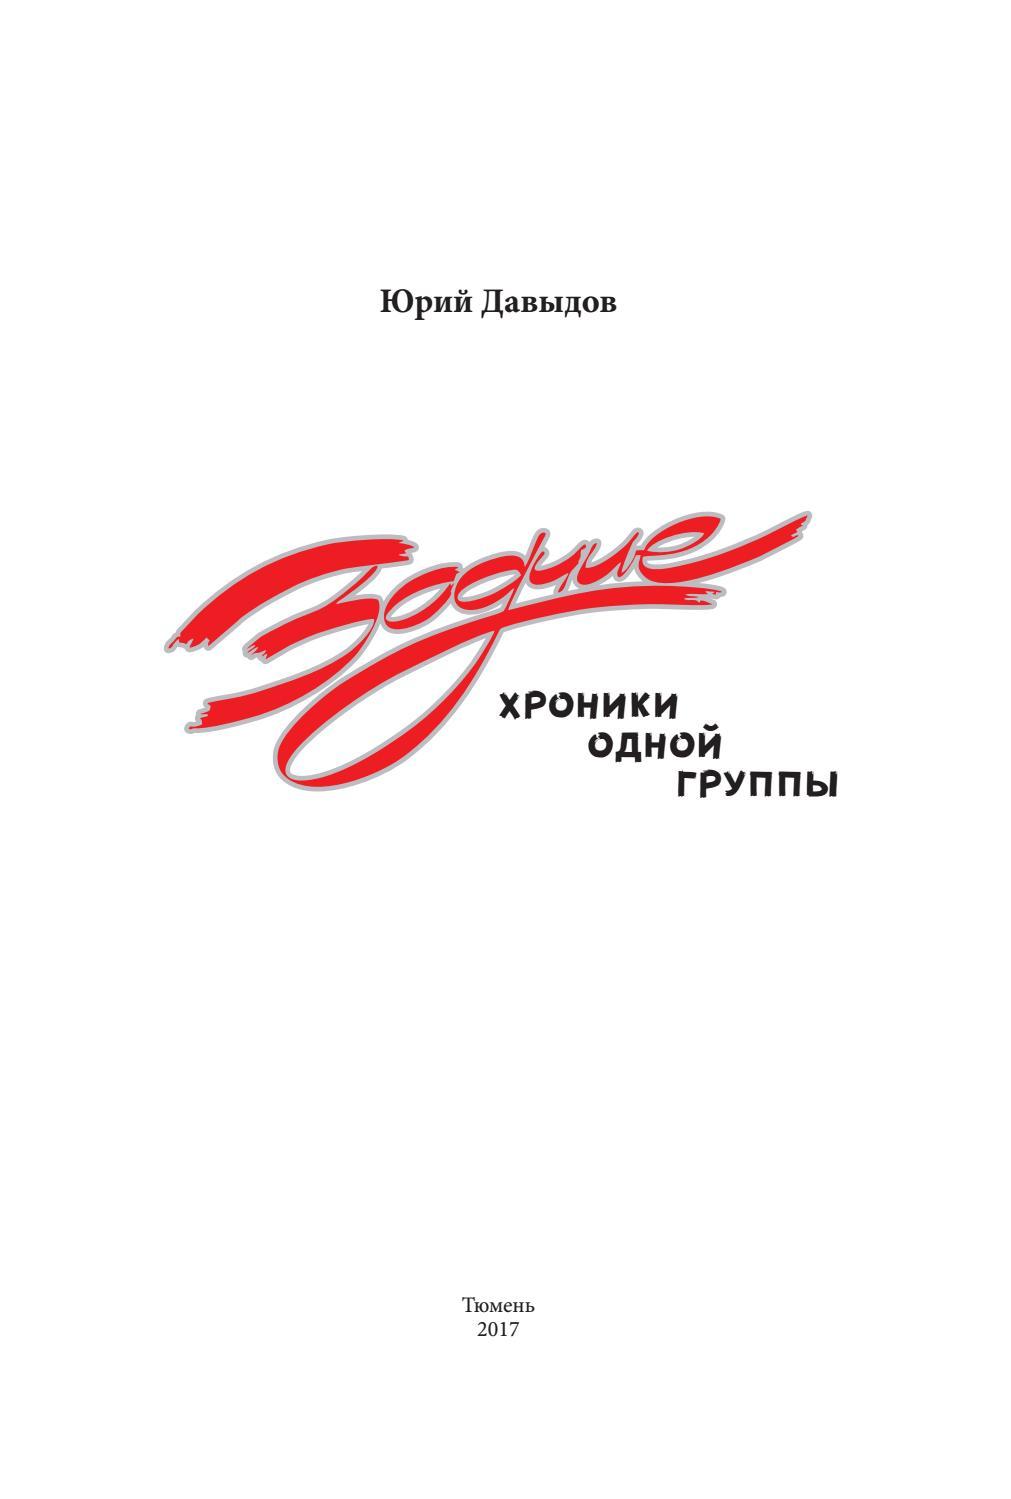 1a4f9a9a3c53 Юрий Давыдов – «Зодчие». Хроники одной группы by Starco - issuu